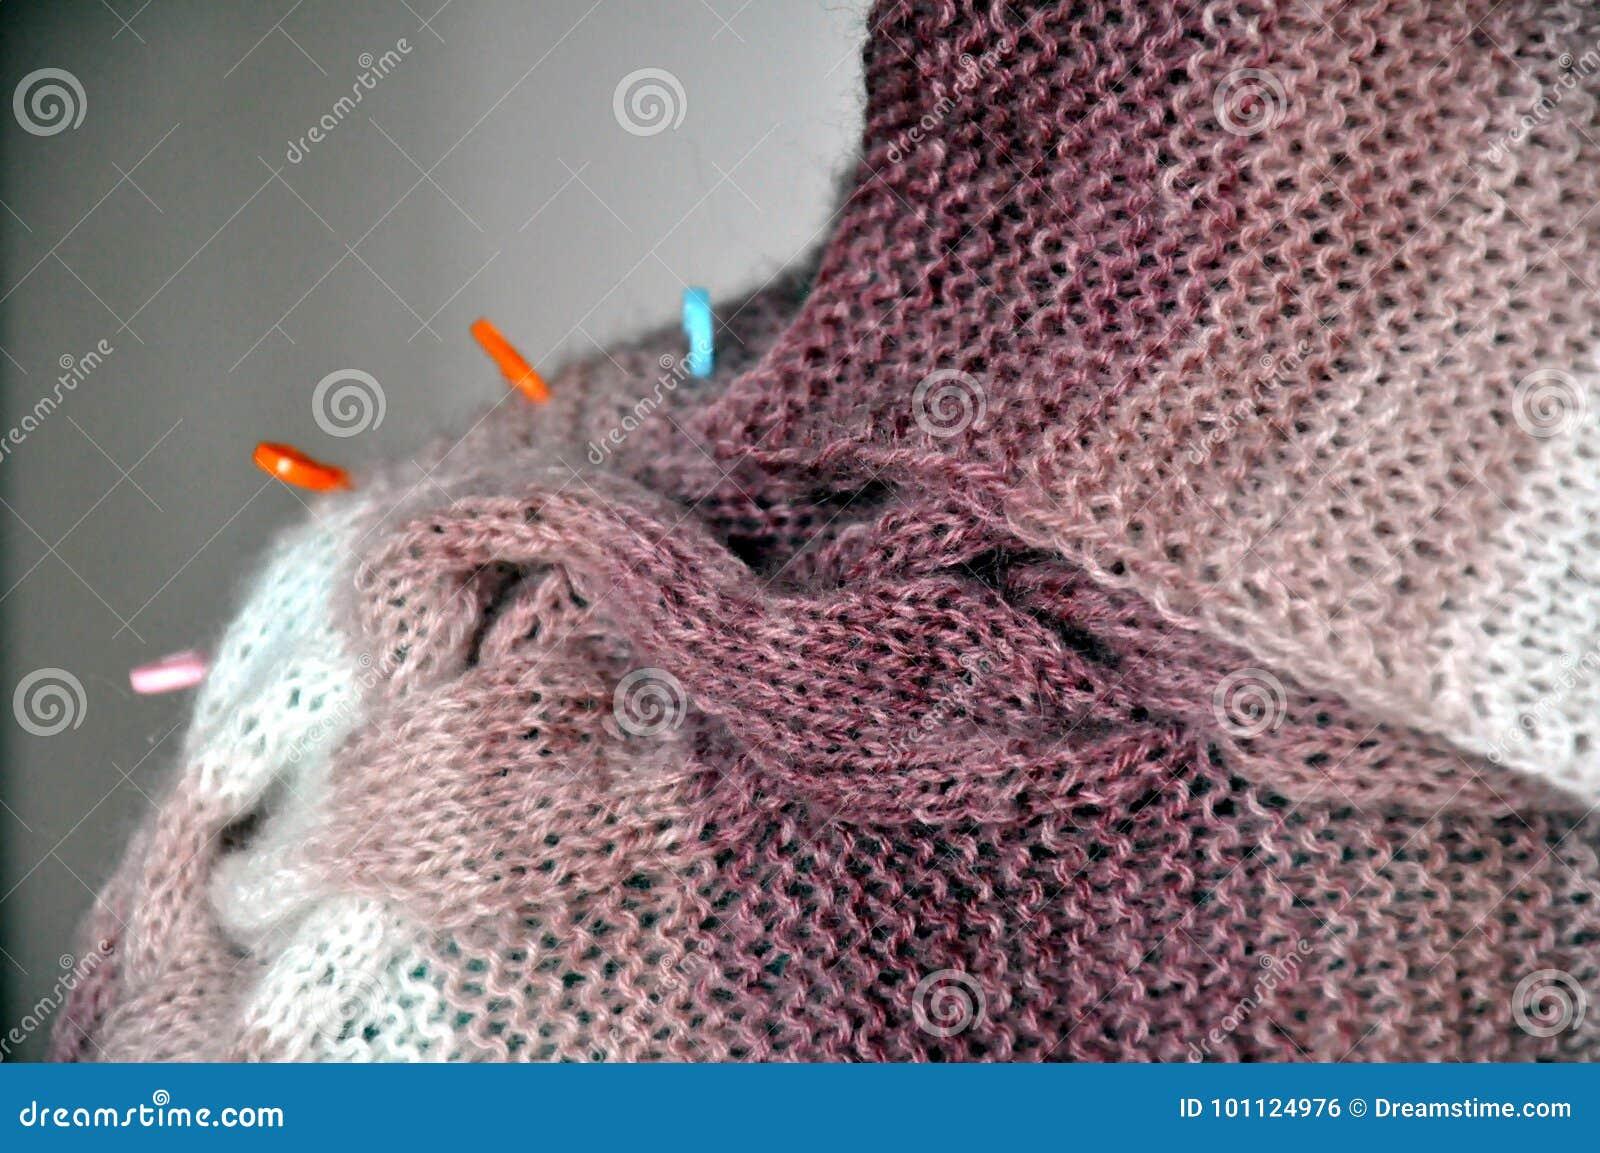 67fa599abdc3 Πλέξιμο από ένα γούνινο νήμα Στοκ Εικόνες - εικόνα από κύκλος ...